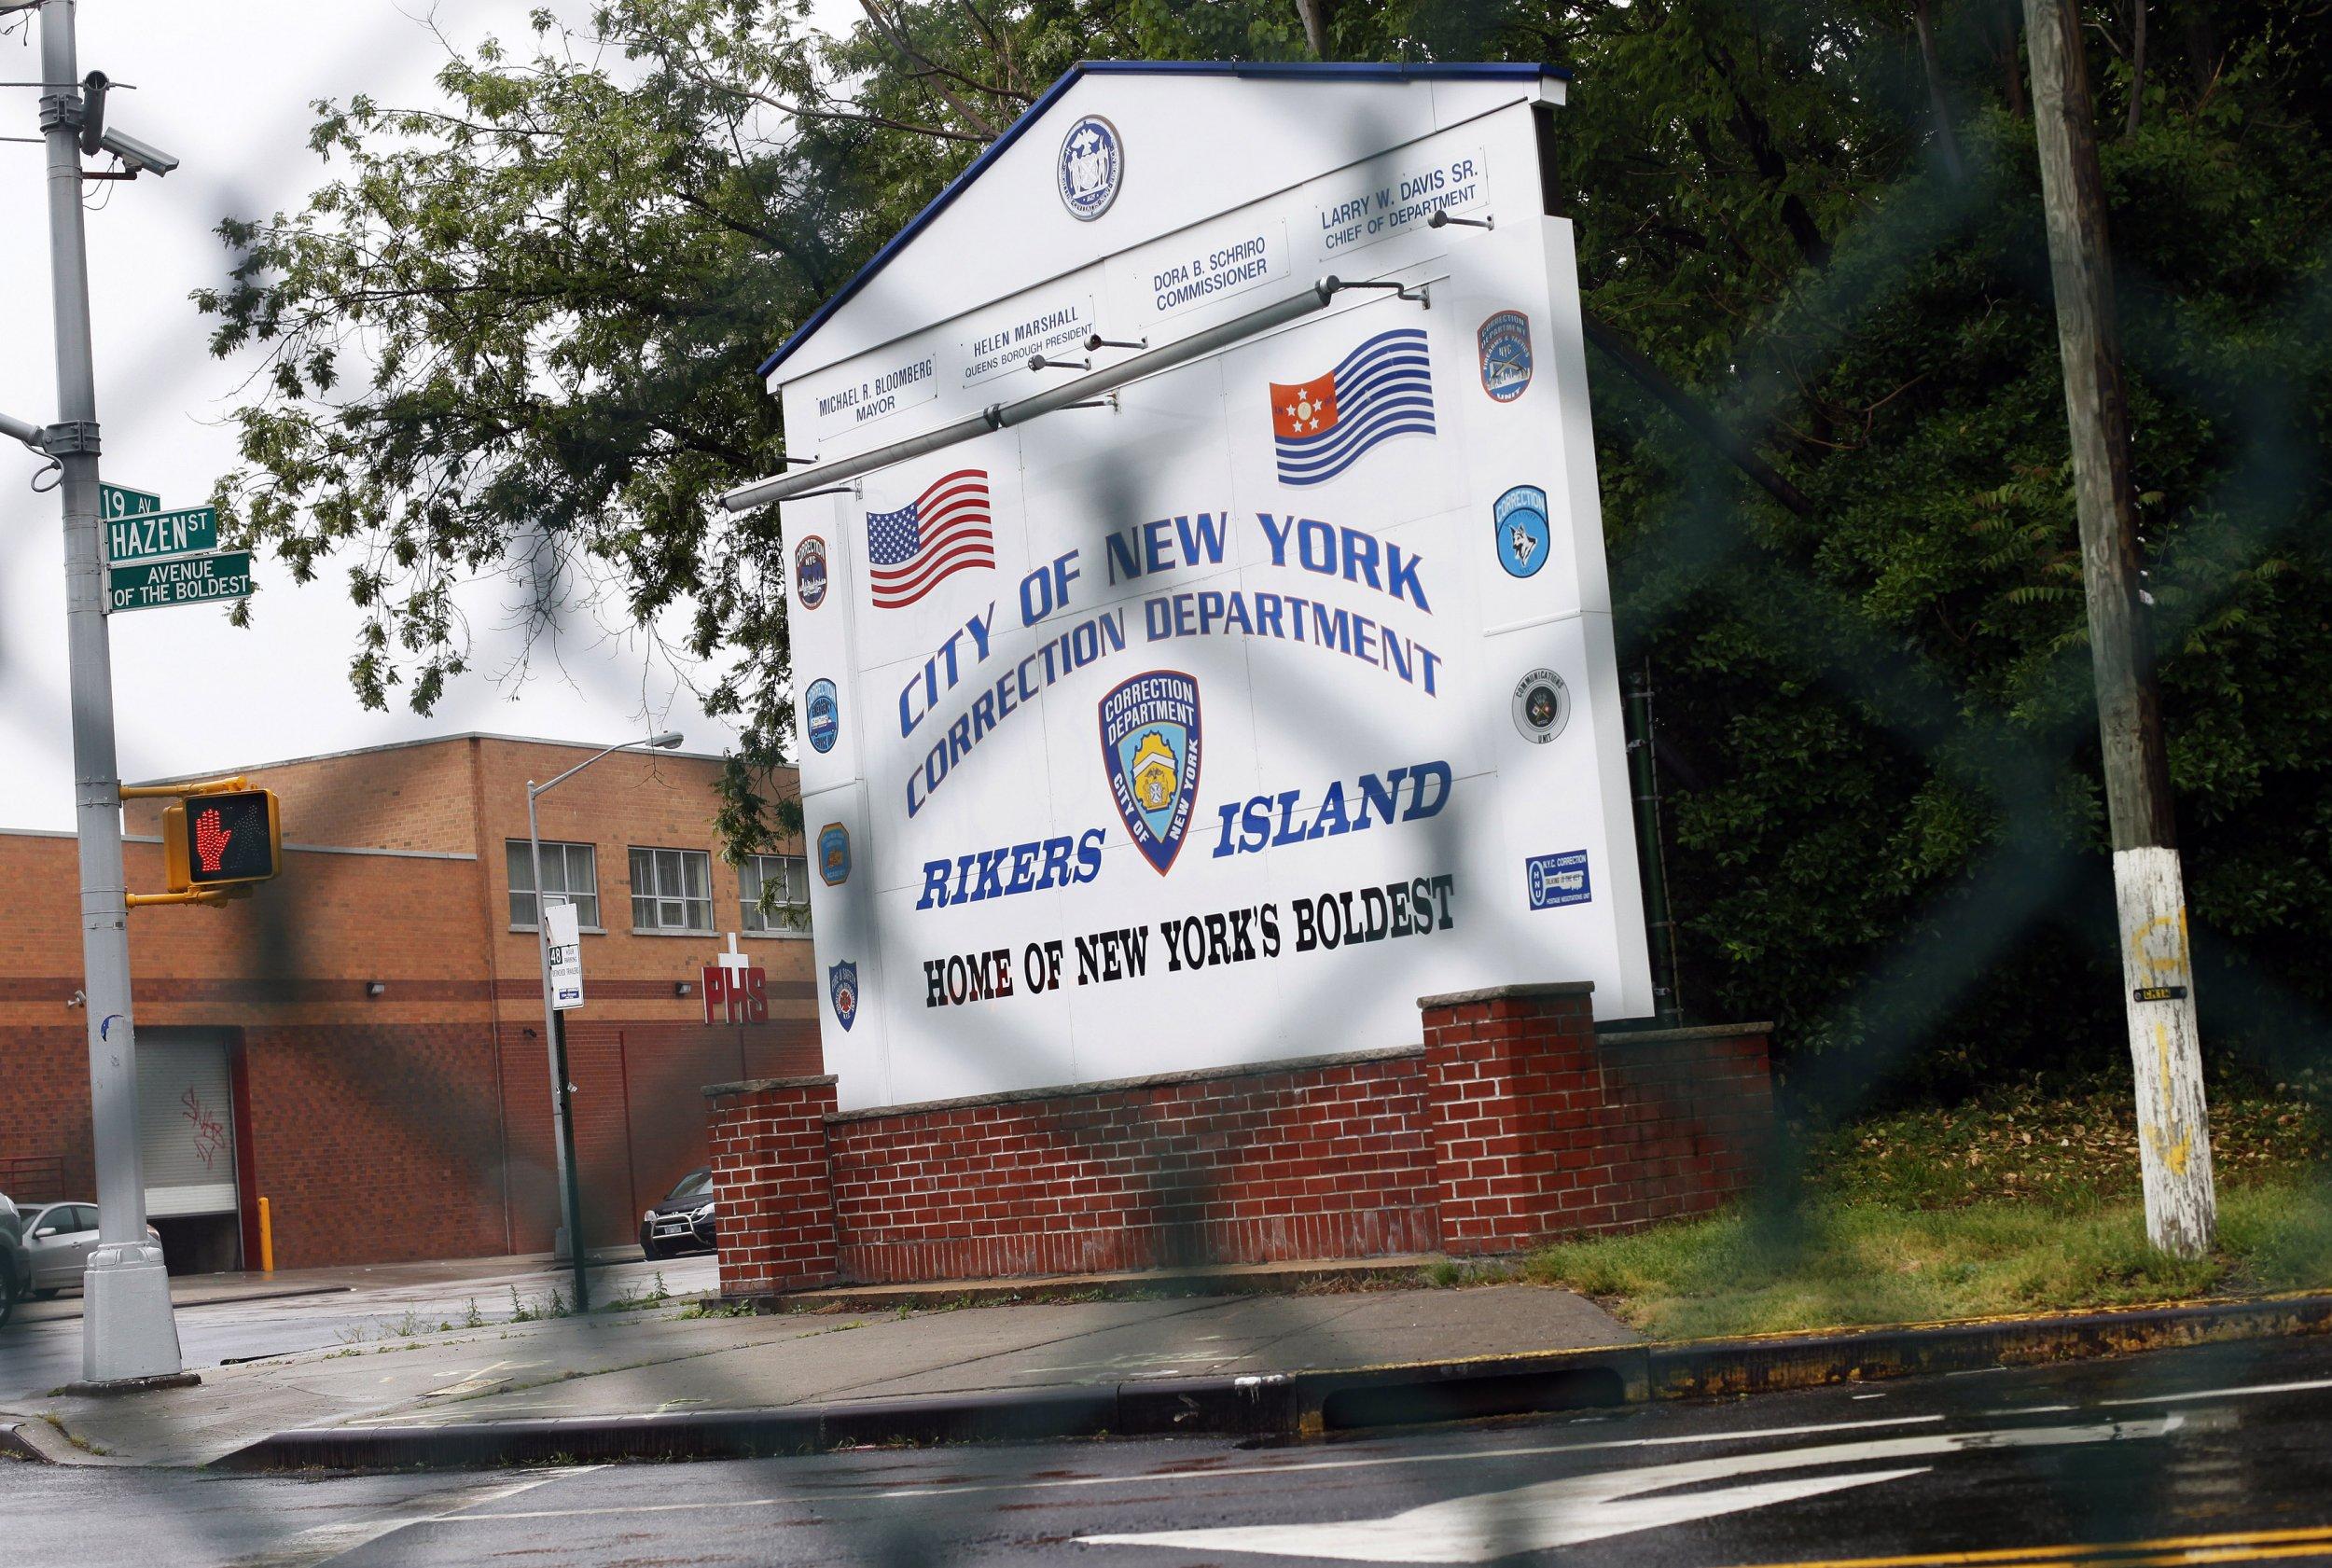 12-4-14 Rikers Island